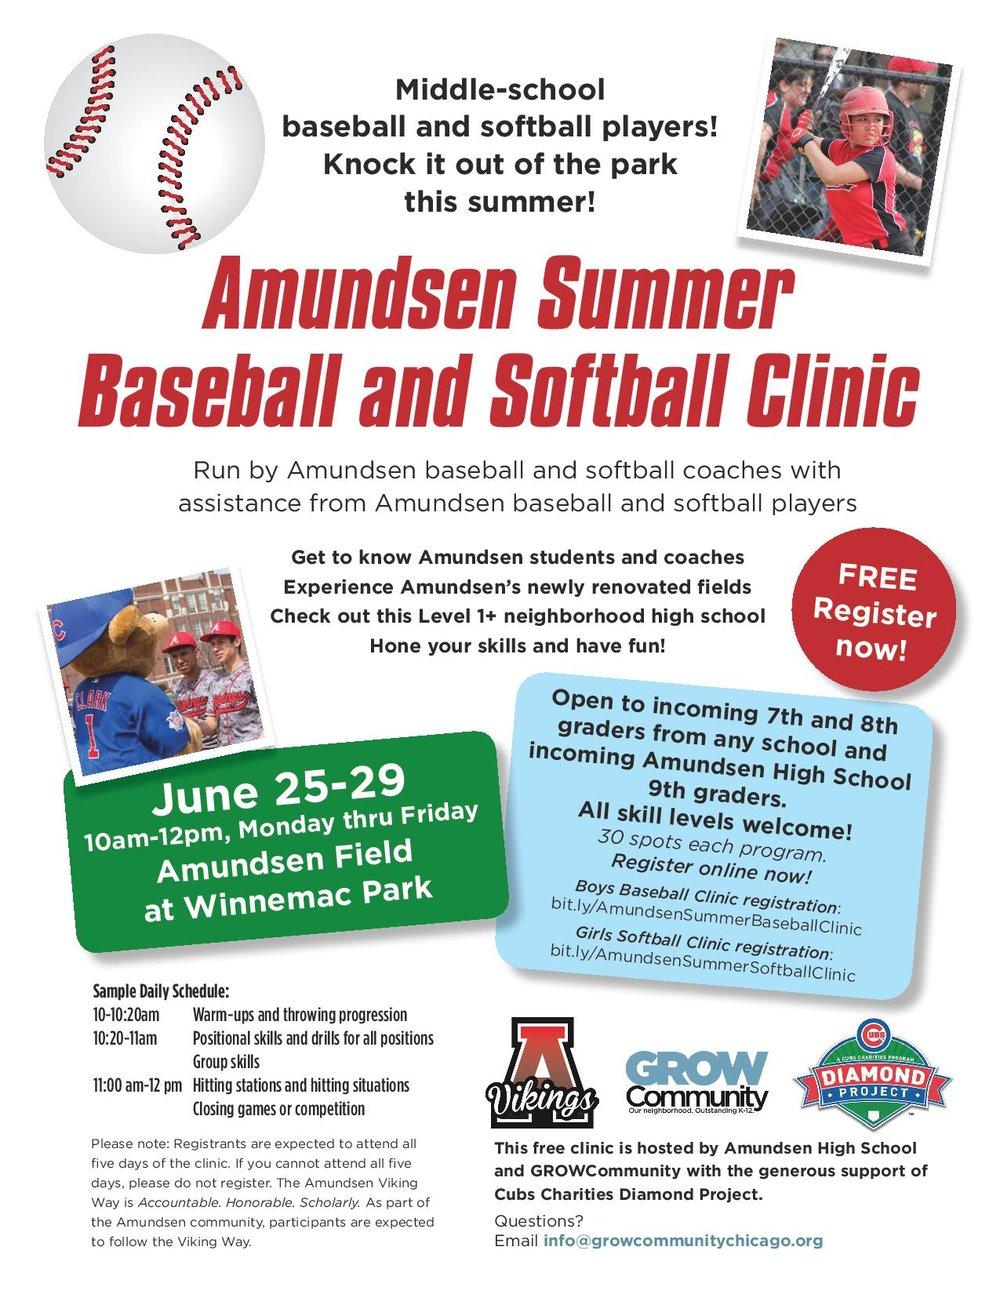 Amudsen Summer Baseball and Softball Clinic